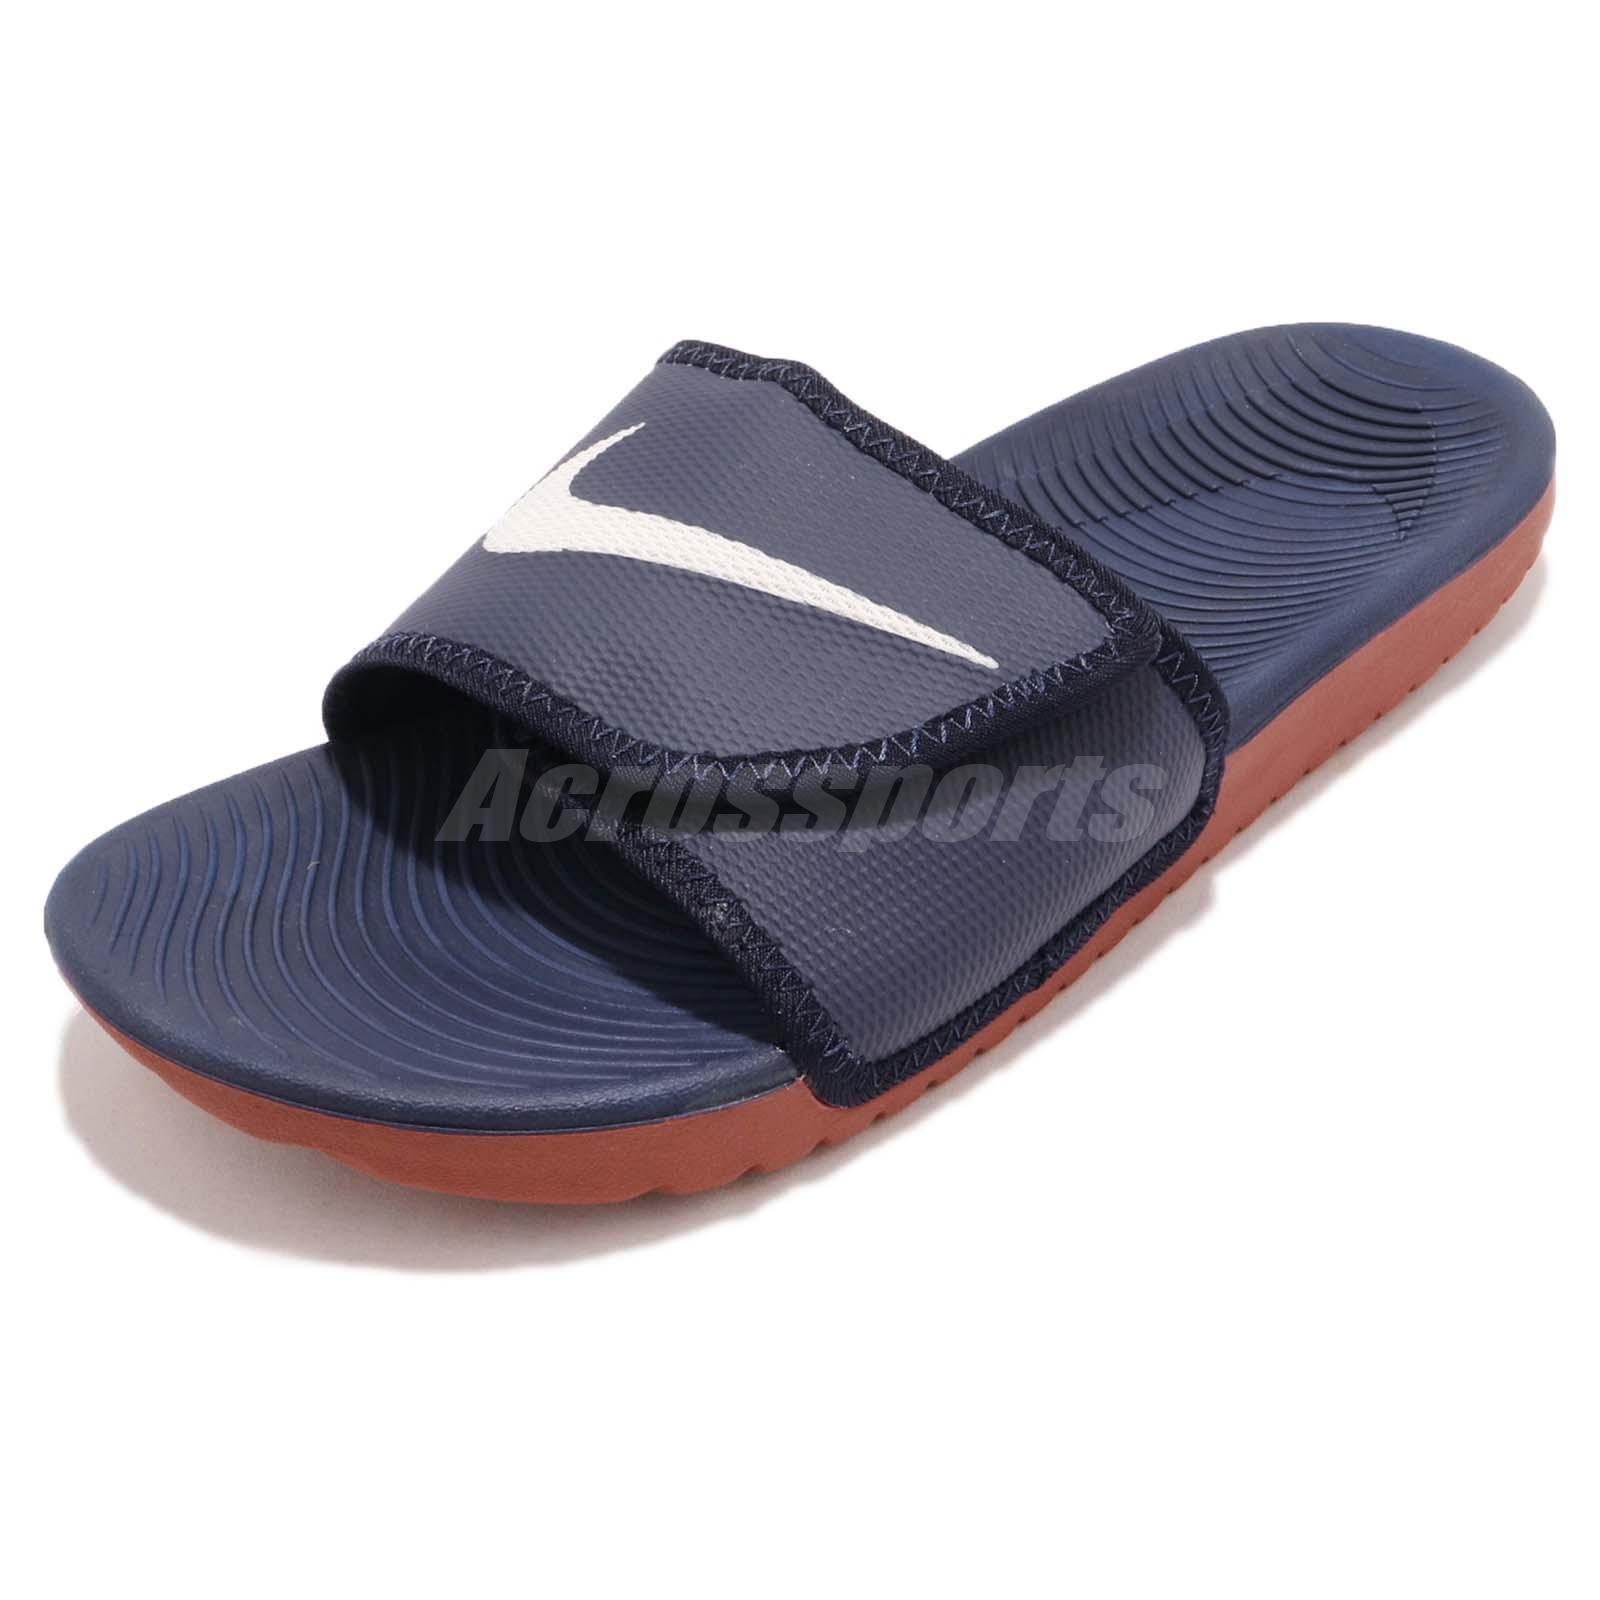 huge discount 45b20 77782 Details about Nike Kawa Adjust Navy White Dune Red Men Sports Sandals Slide  Slipper 834818-404